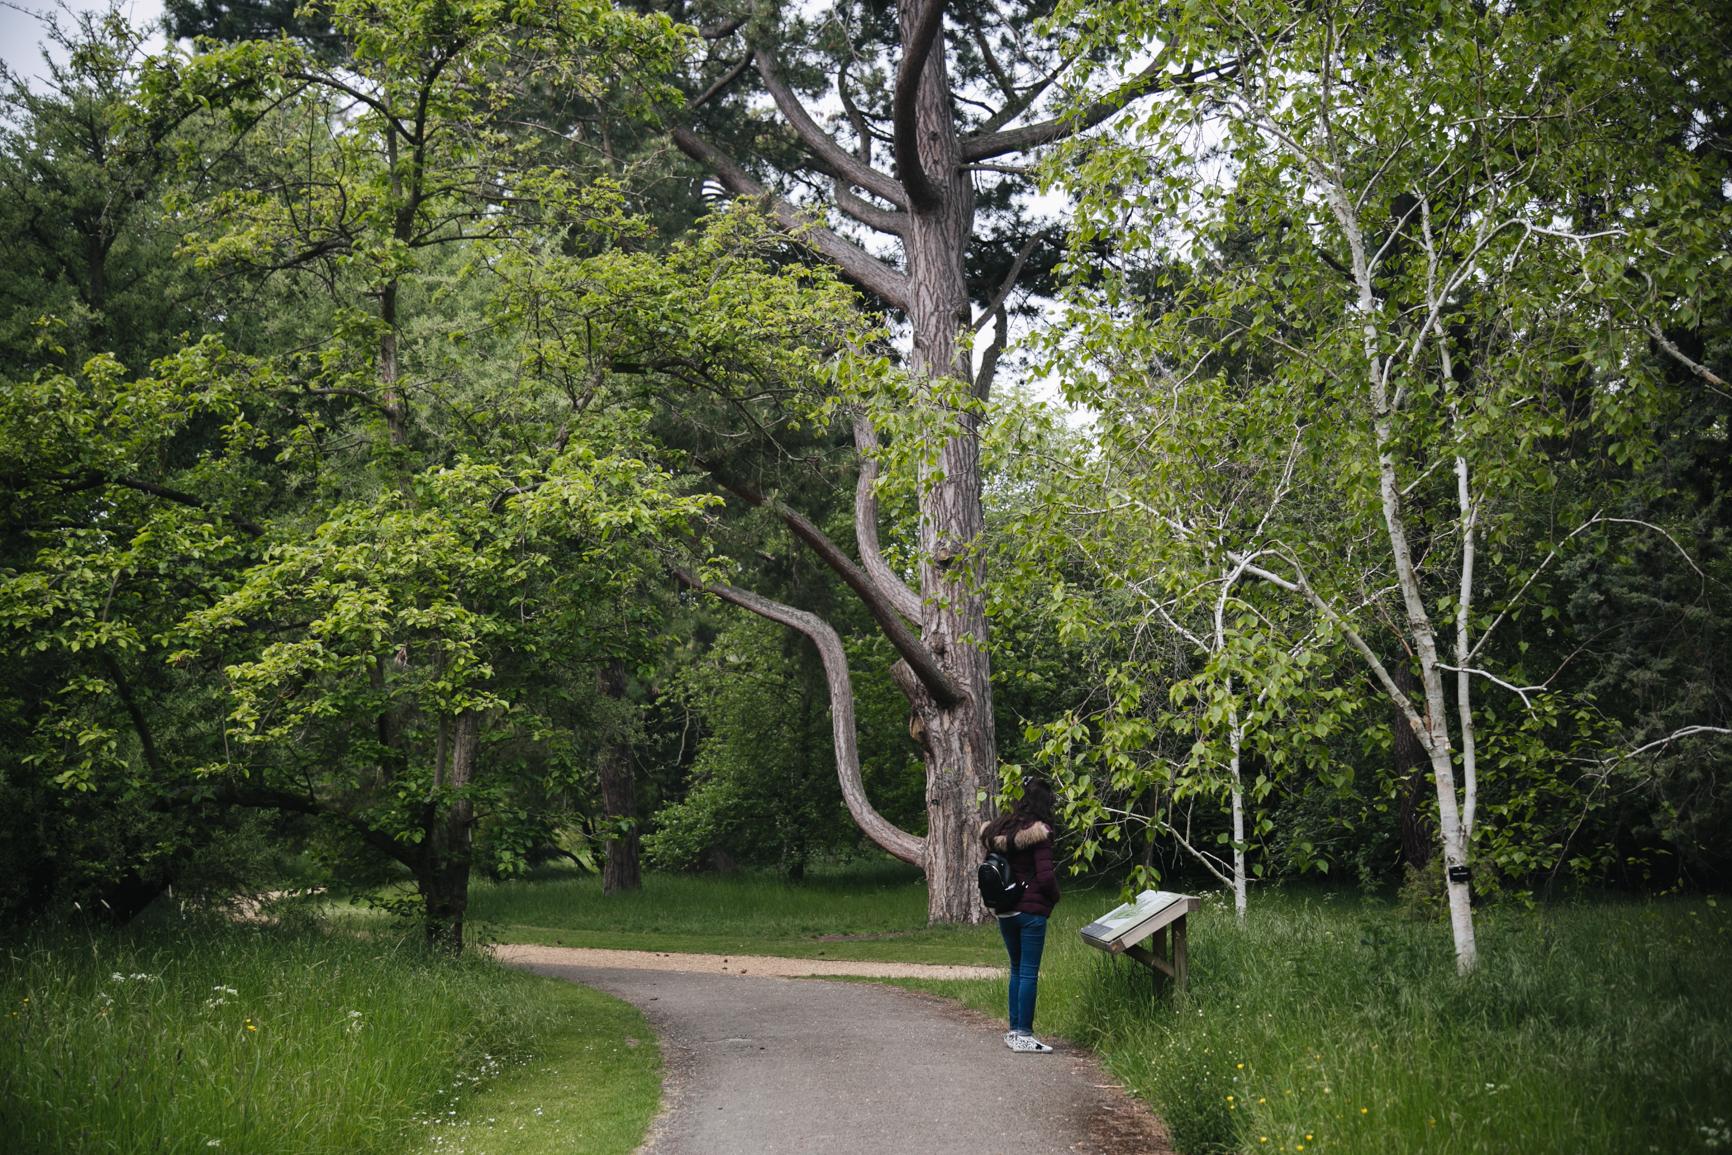 Jardin-botanique-universite-de-cambridge.jpg